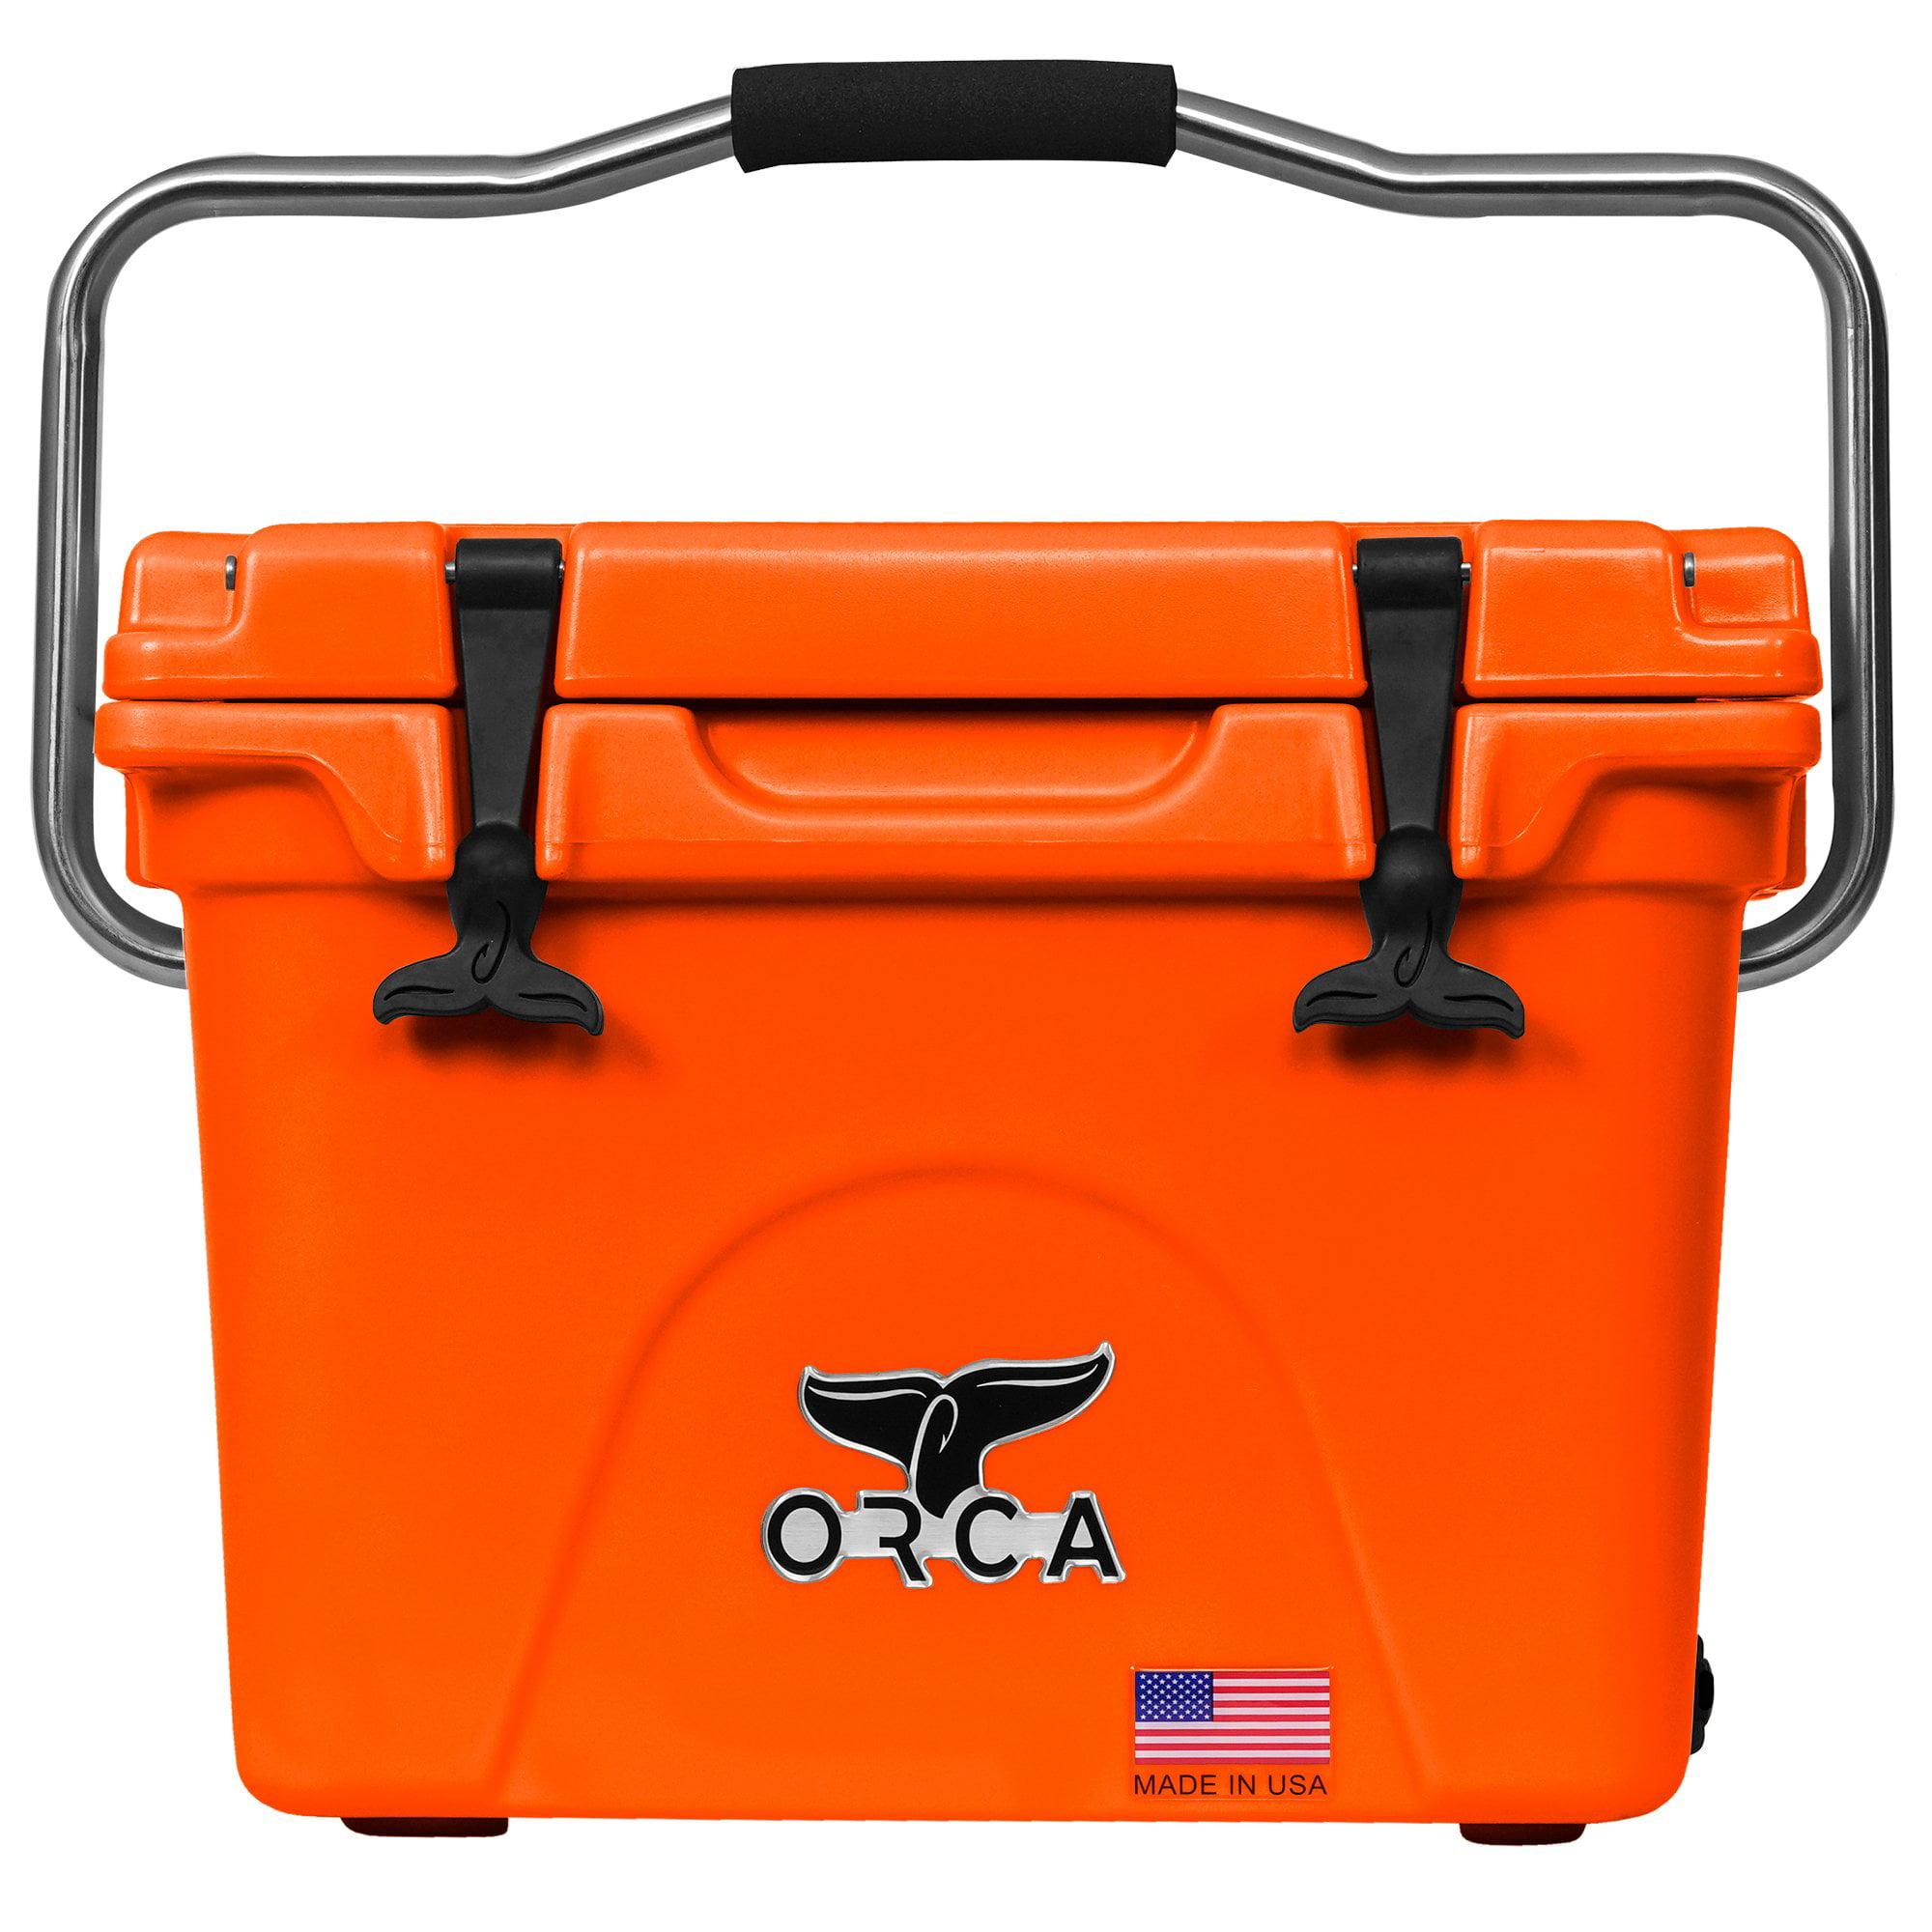 ORCA High Performance 20 Quart 18 Can Heavy-Duty Insulated Cooler, Blaze Orange